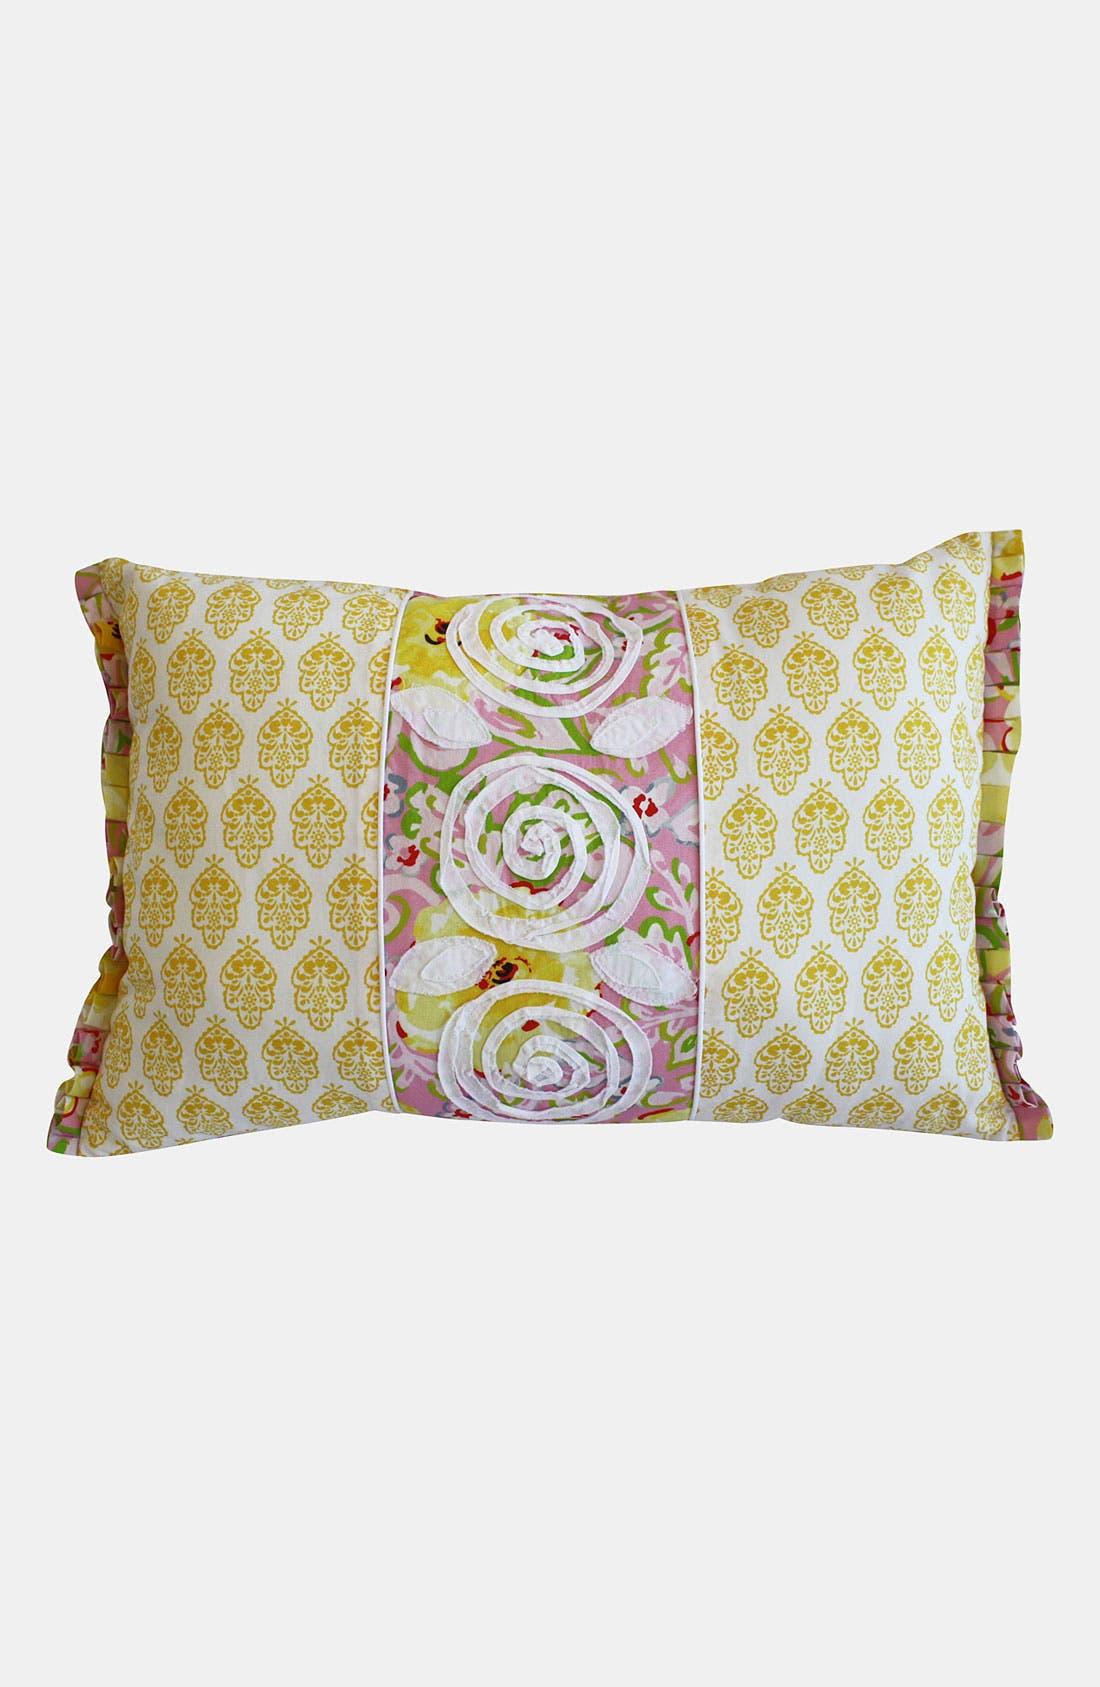 Main Image - Dena Home 'Annabelle' Appliqué Pillow